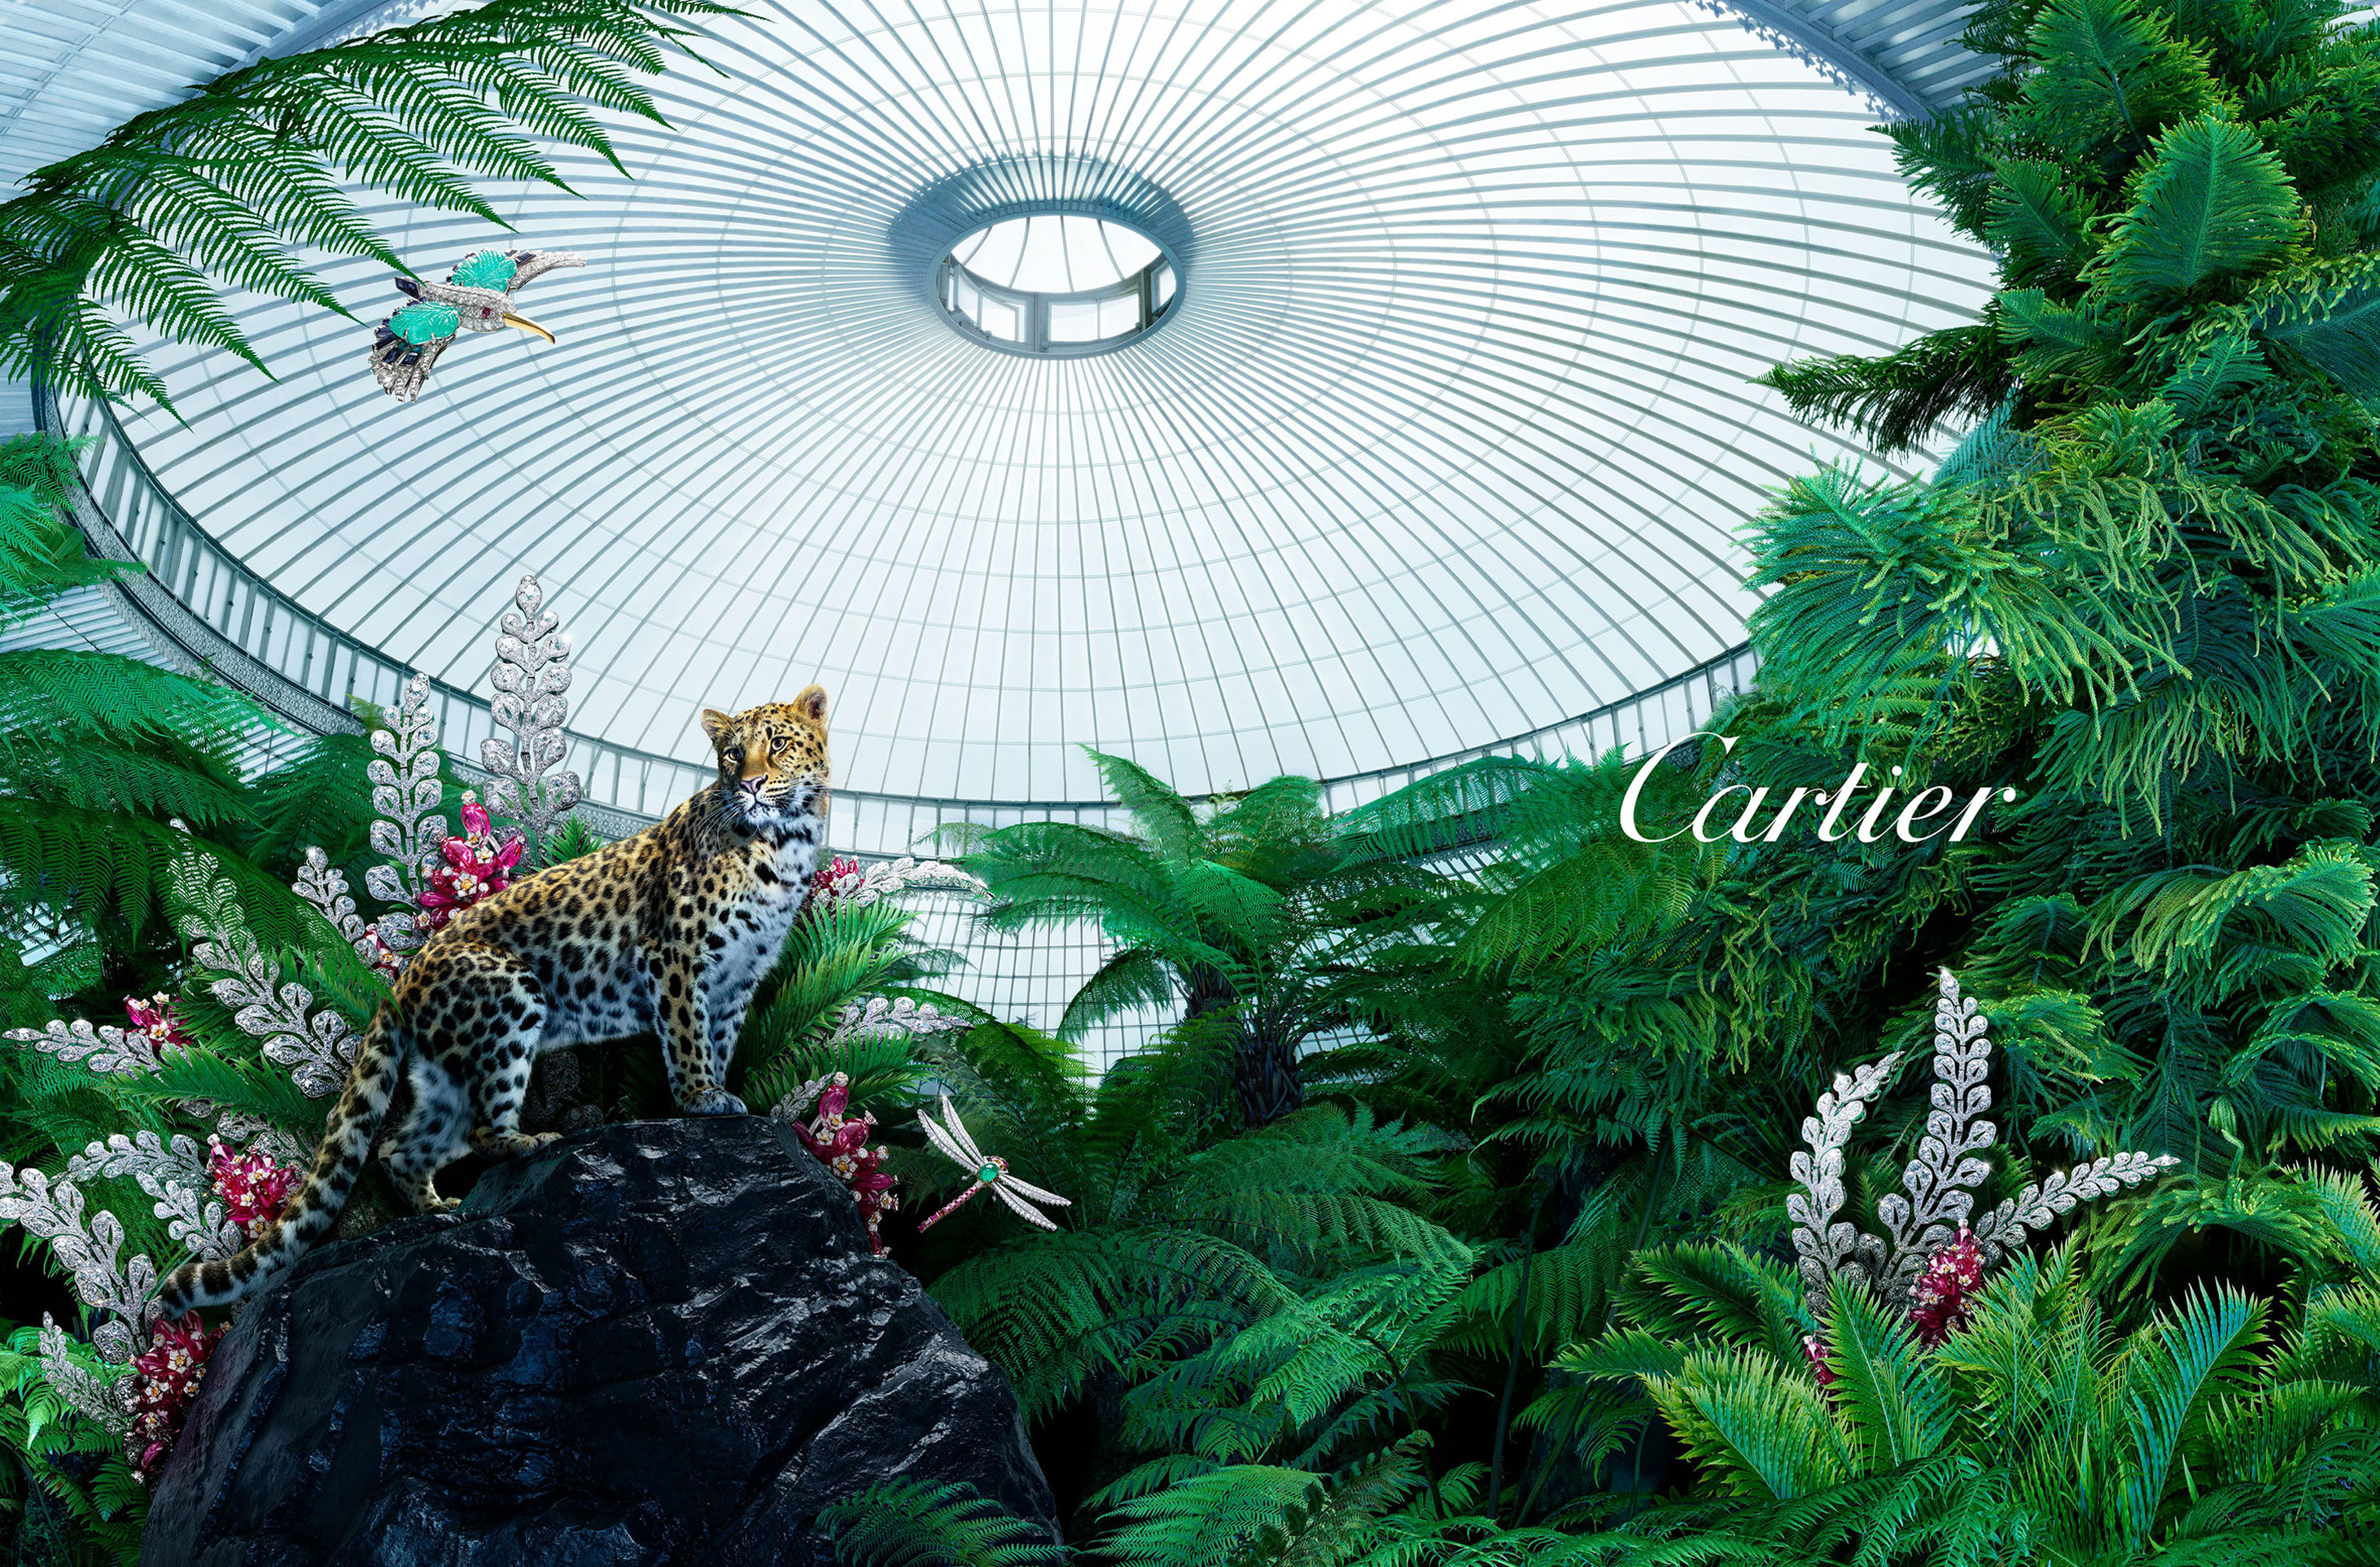 Cartier Bestiaire by Nadav Kander